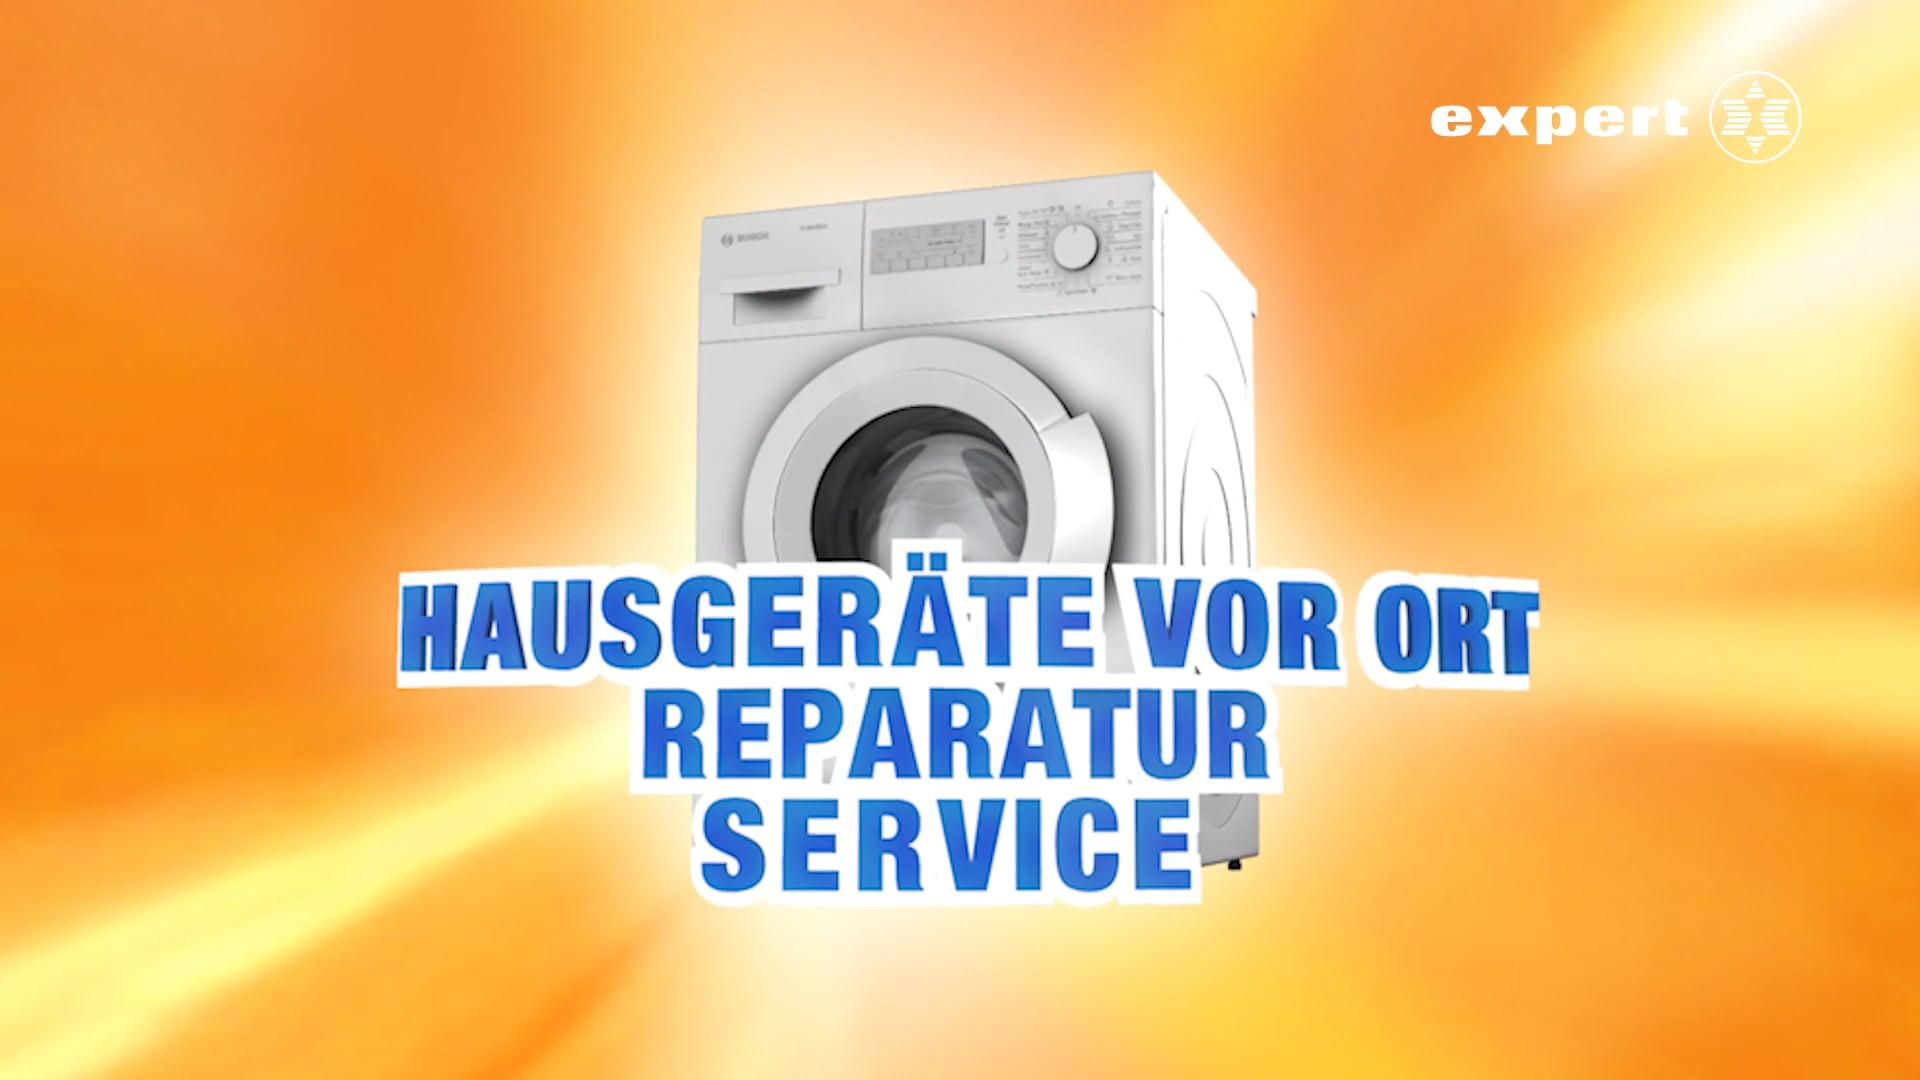 Hausgeräte-Reparatur-Service | expert Technikmarkt